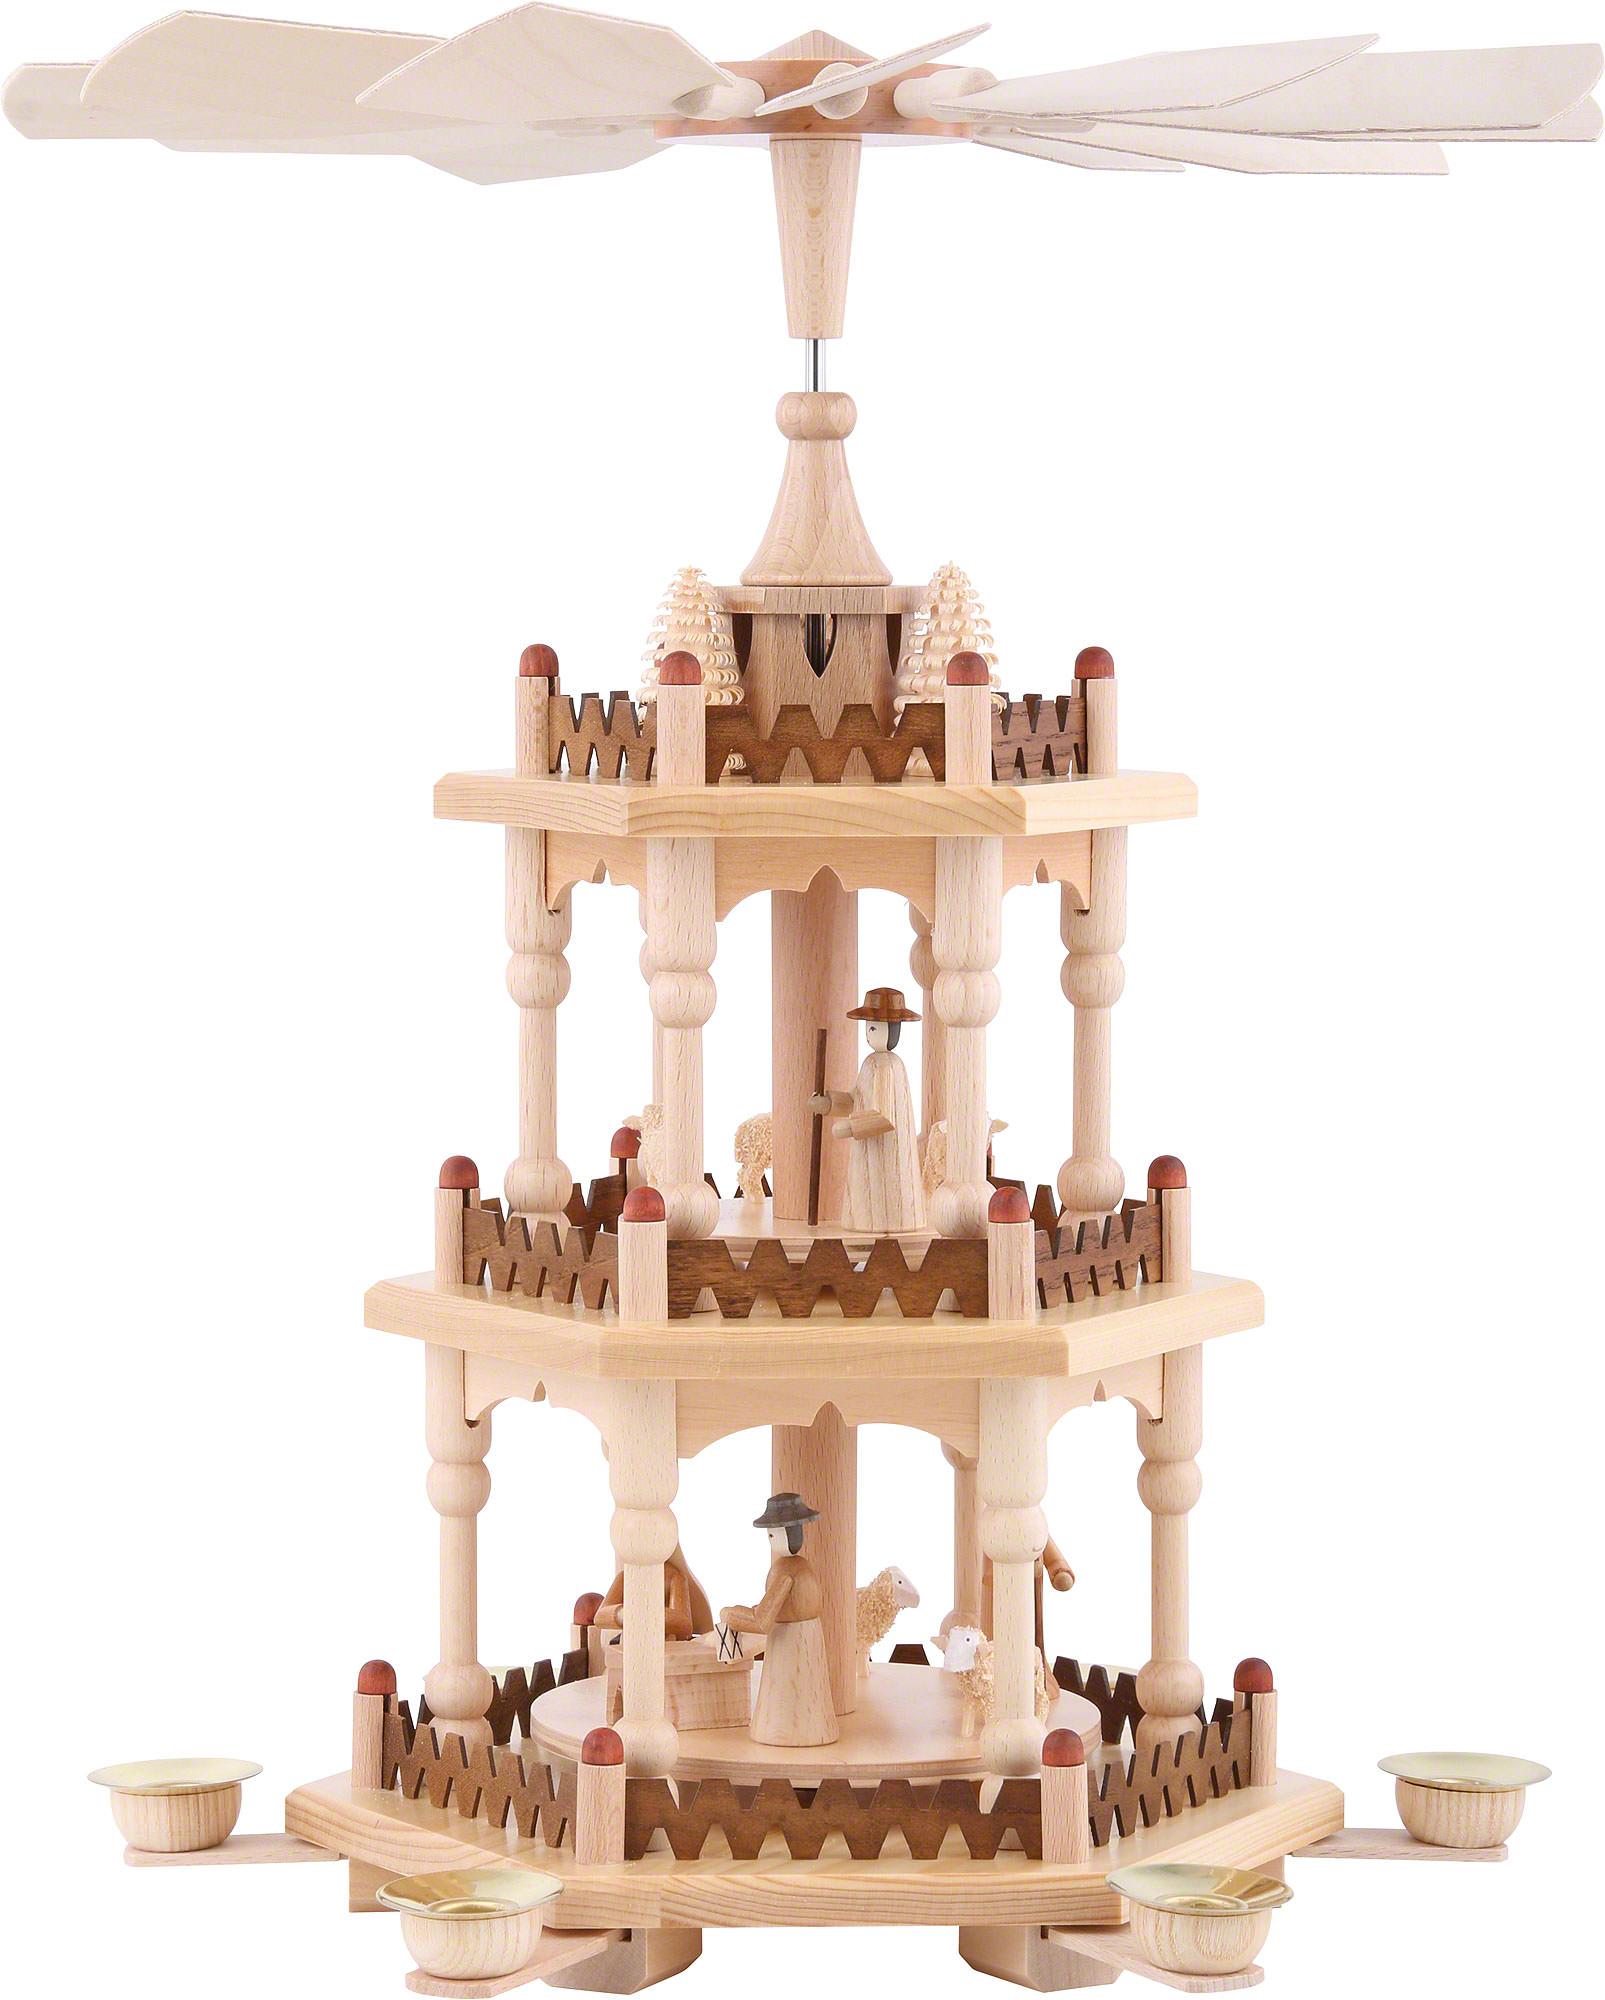 3 tier pyramid merry christmas 41 cm16in by theo lorenz kunsthandwerk